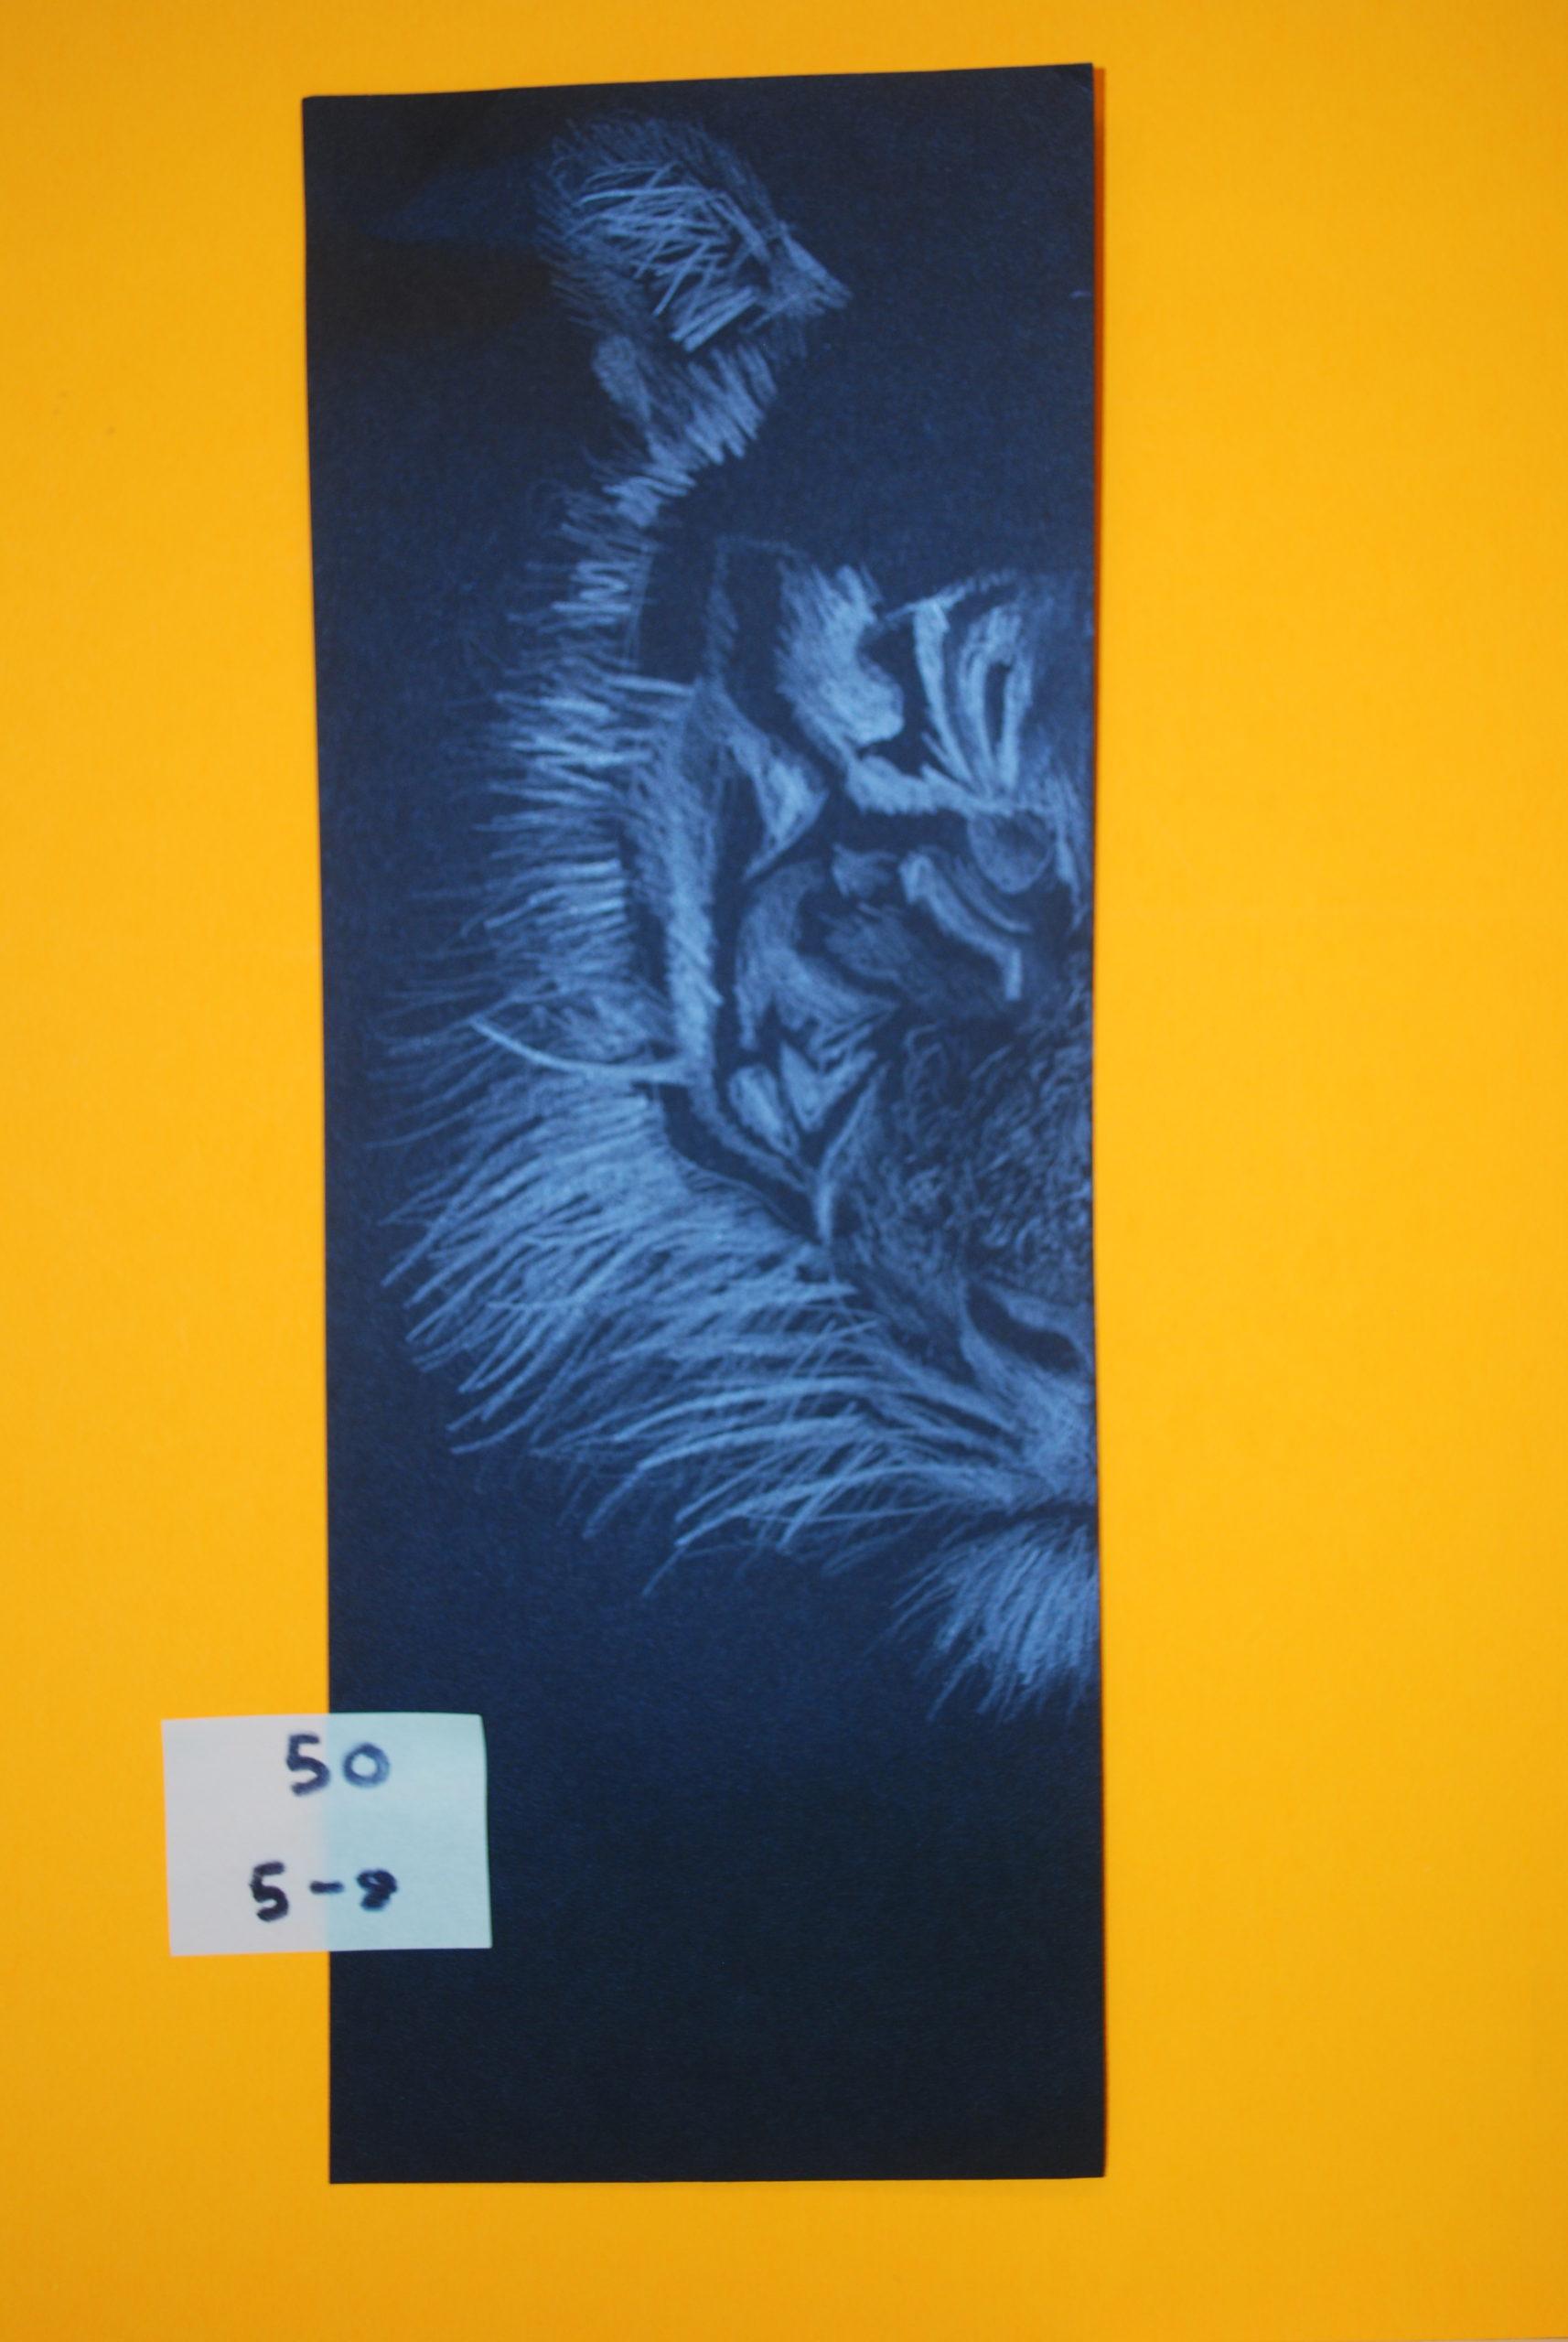 YAC 2020 #50 5-8 Black Tiger Face a